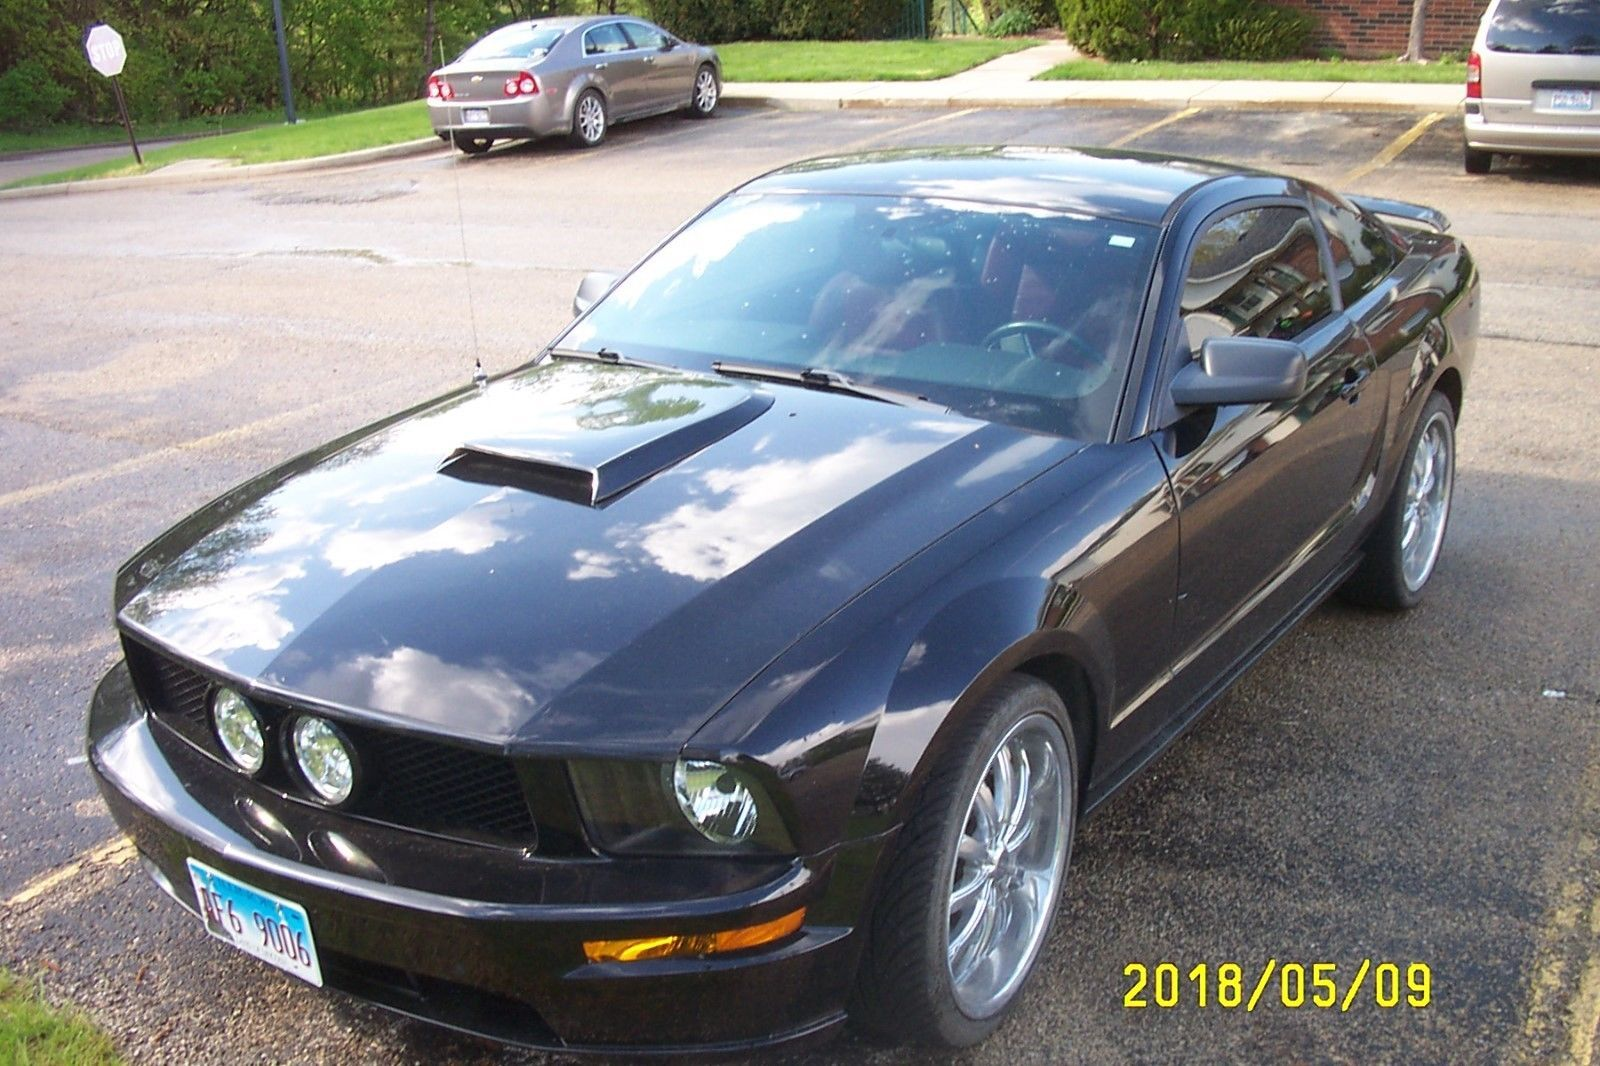 Ebay 2005 Ford Mustang Gt Needs Some Cosmetic Work Along With Sway Bar Repair Carparts Carrepair